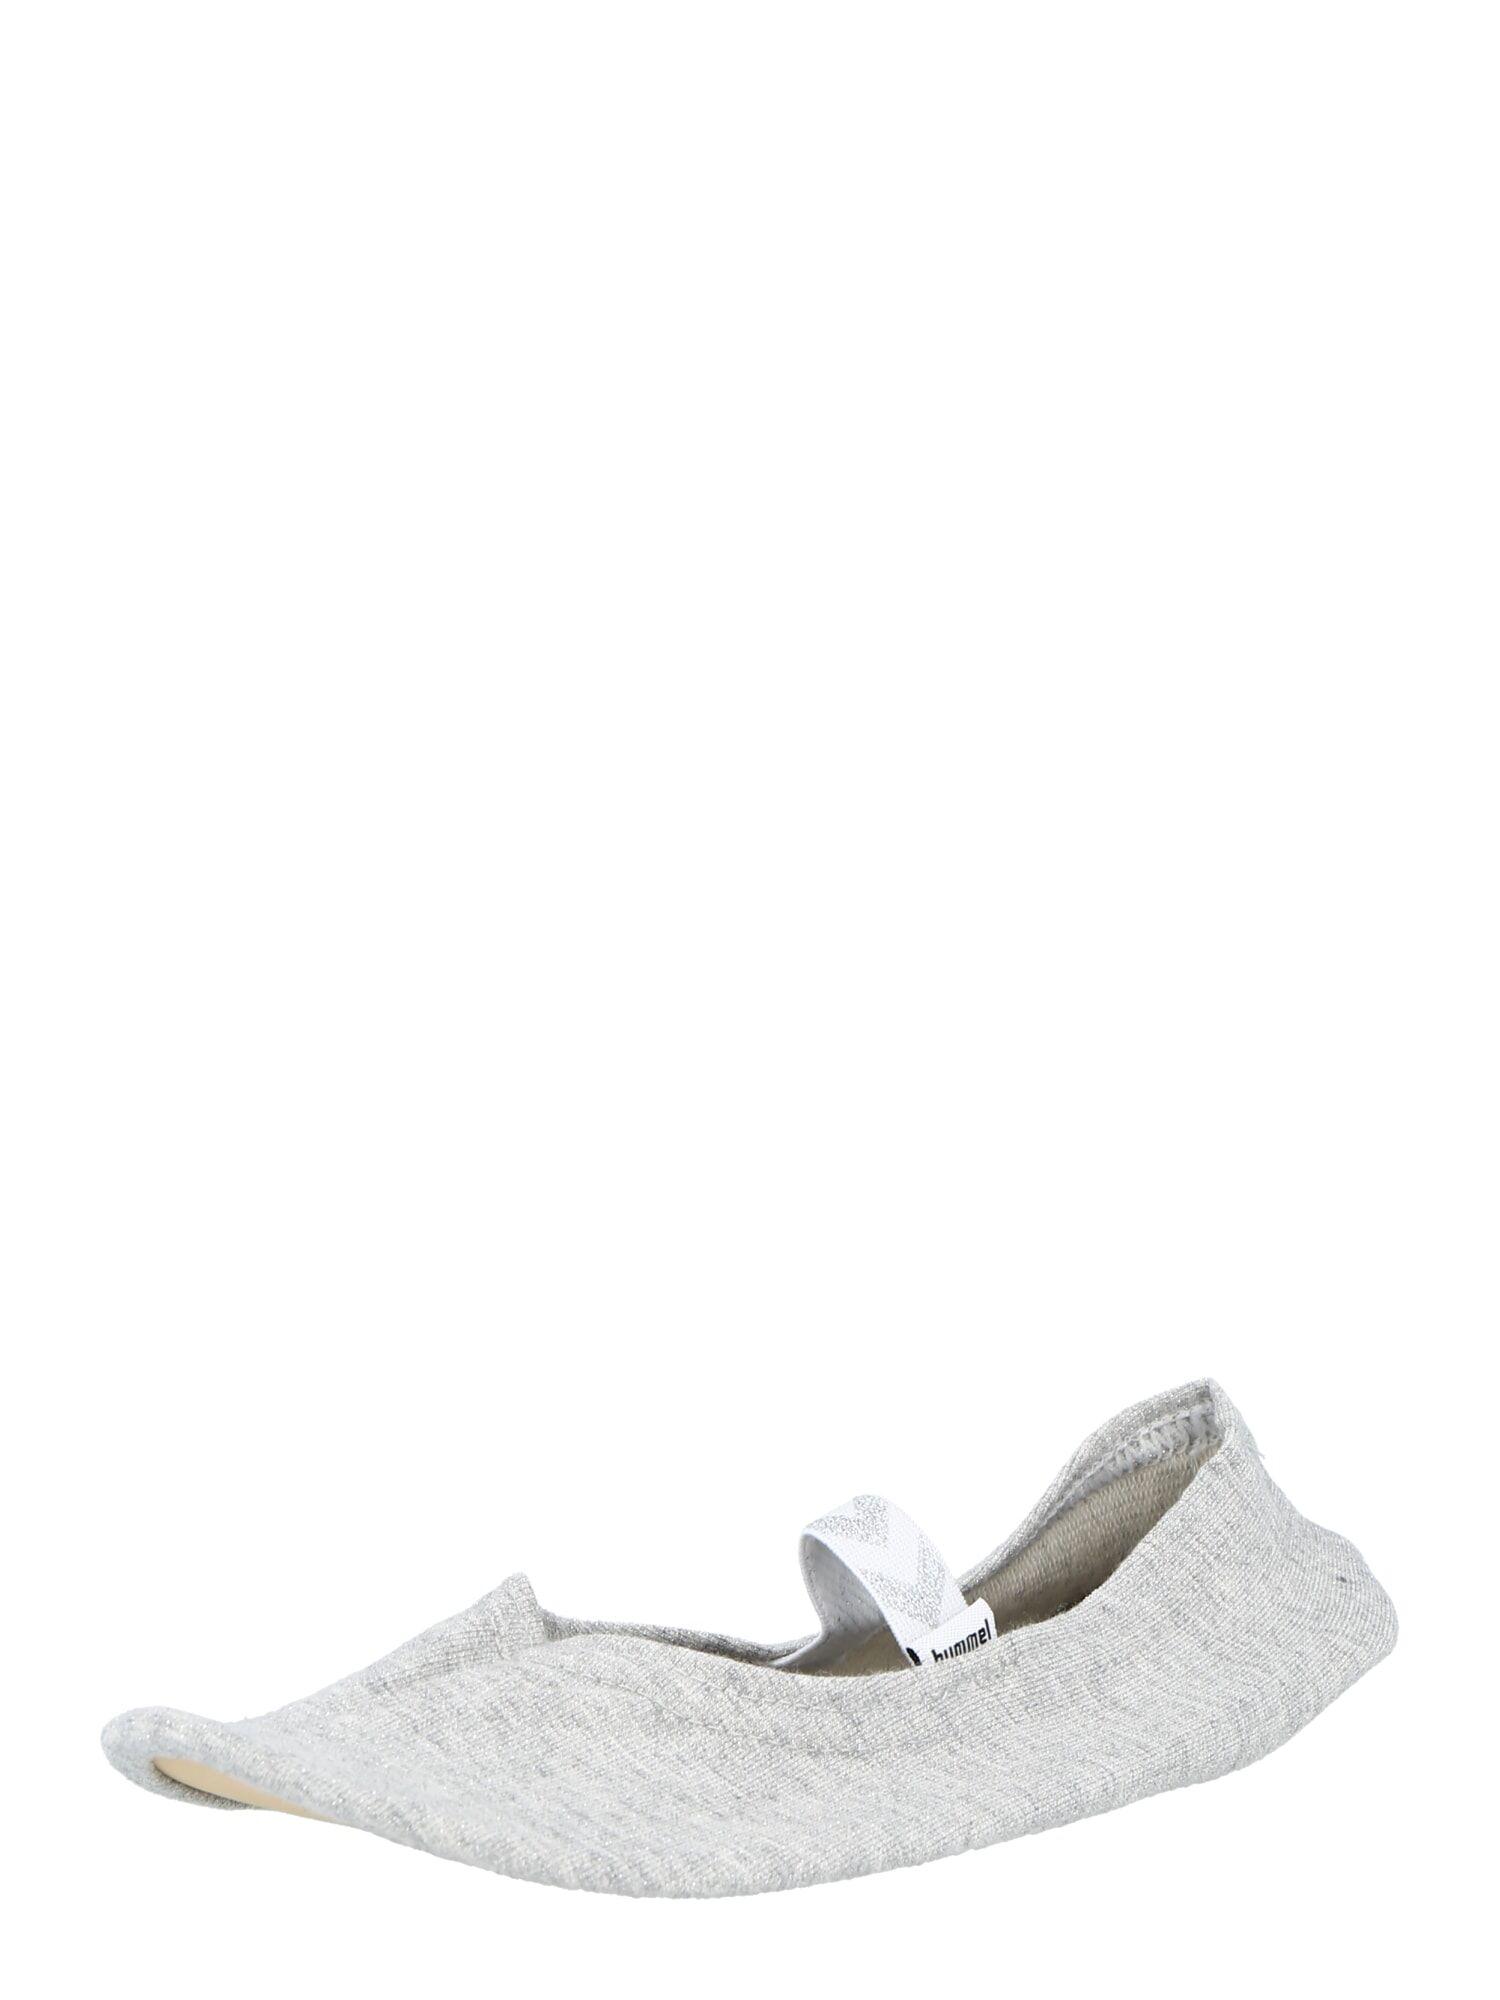 Hummel Chaussure de sport  - Gris - Taille: 32 - boy